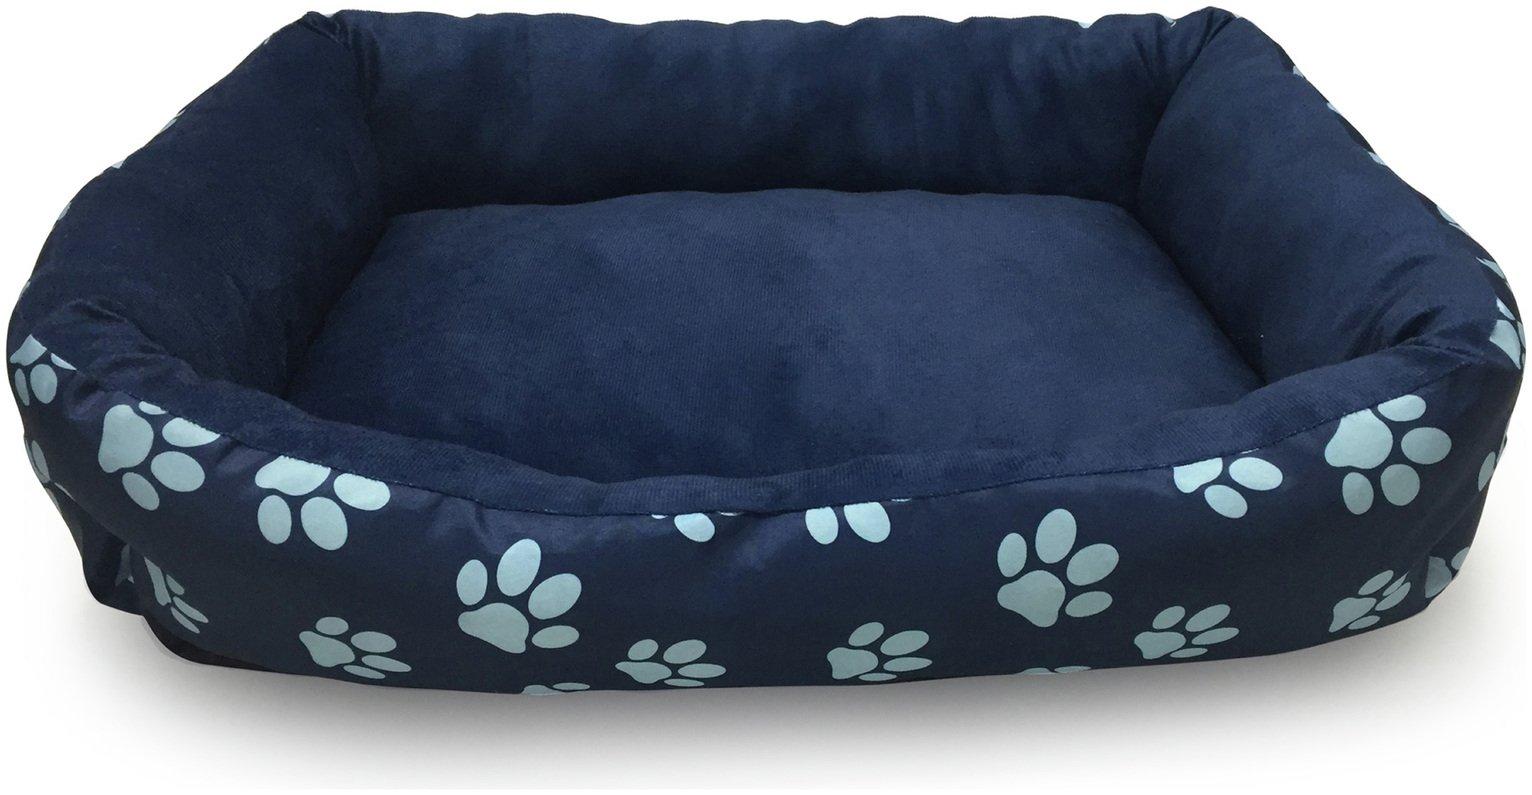 Paw Print Square Navy Cushion - Medium